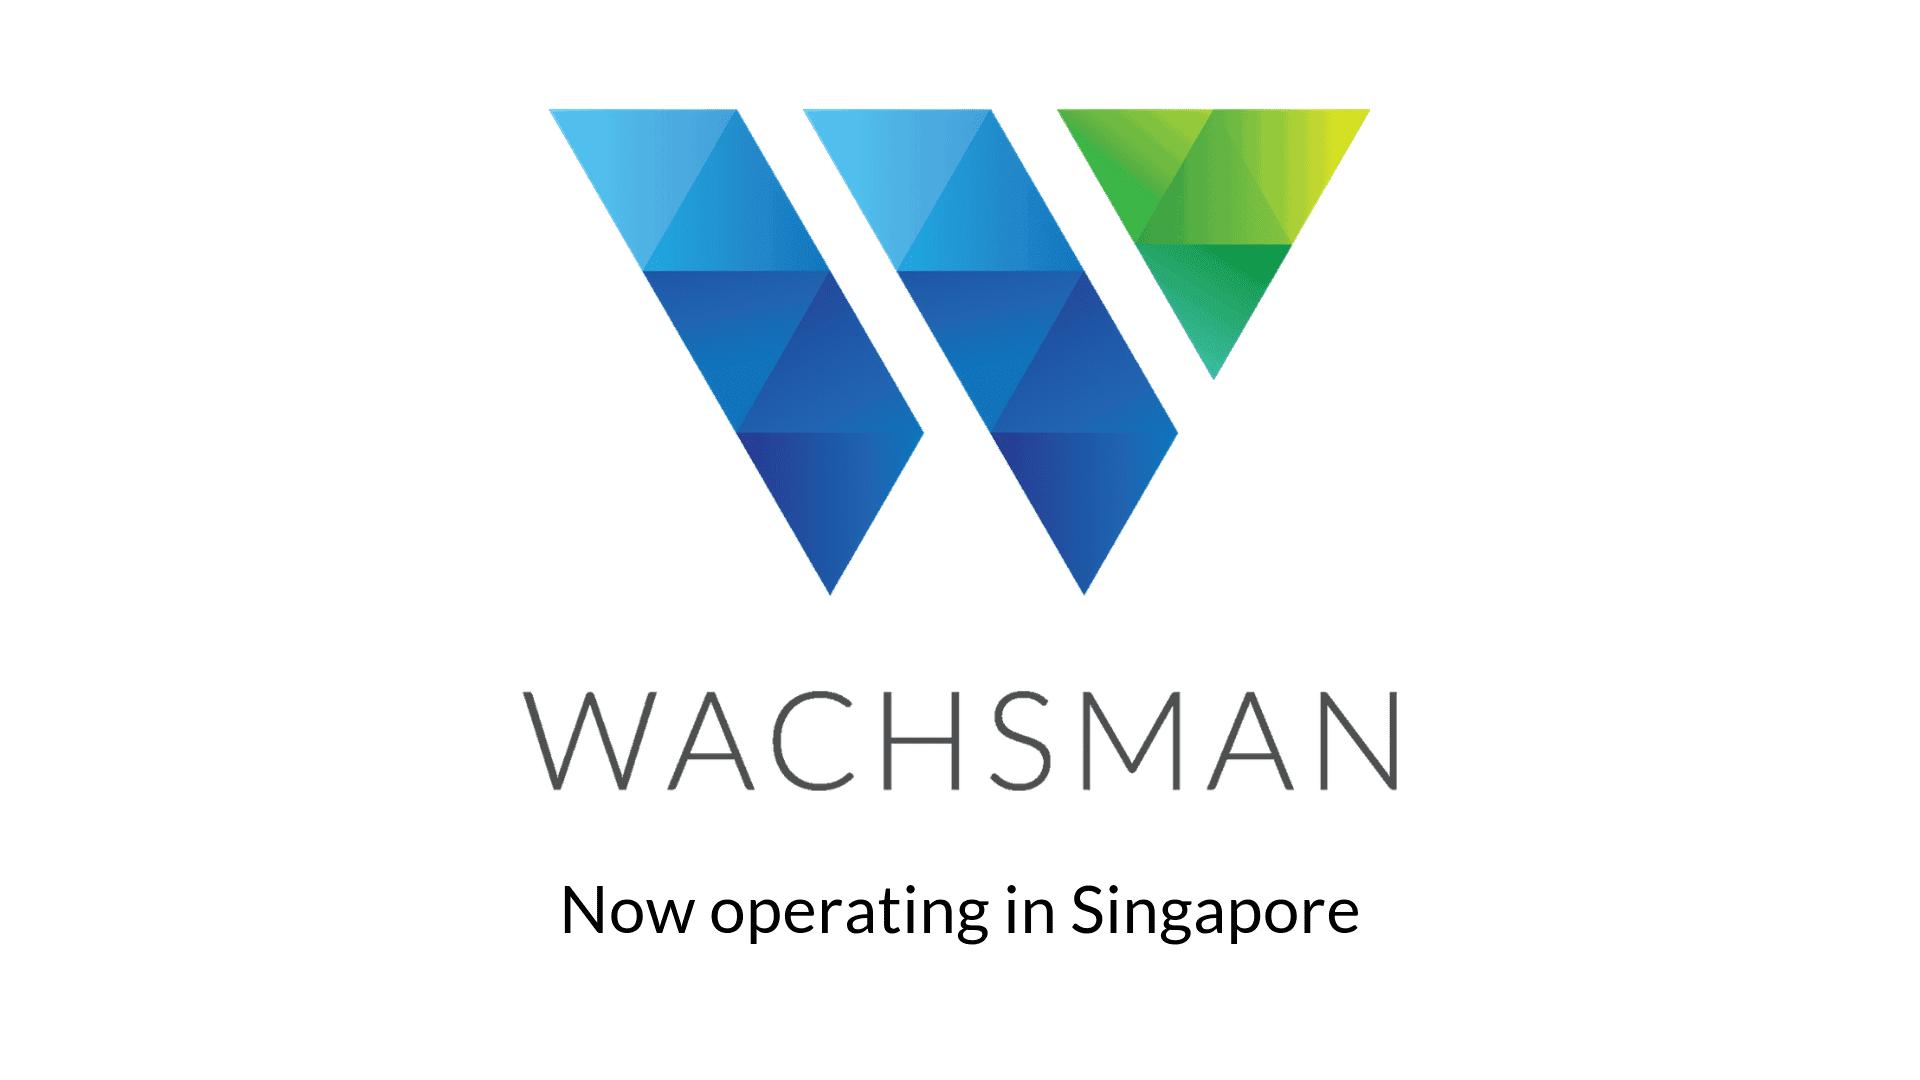 Wachsman-Singapore-Asia-blockchain